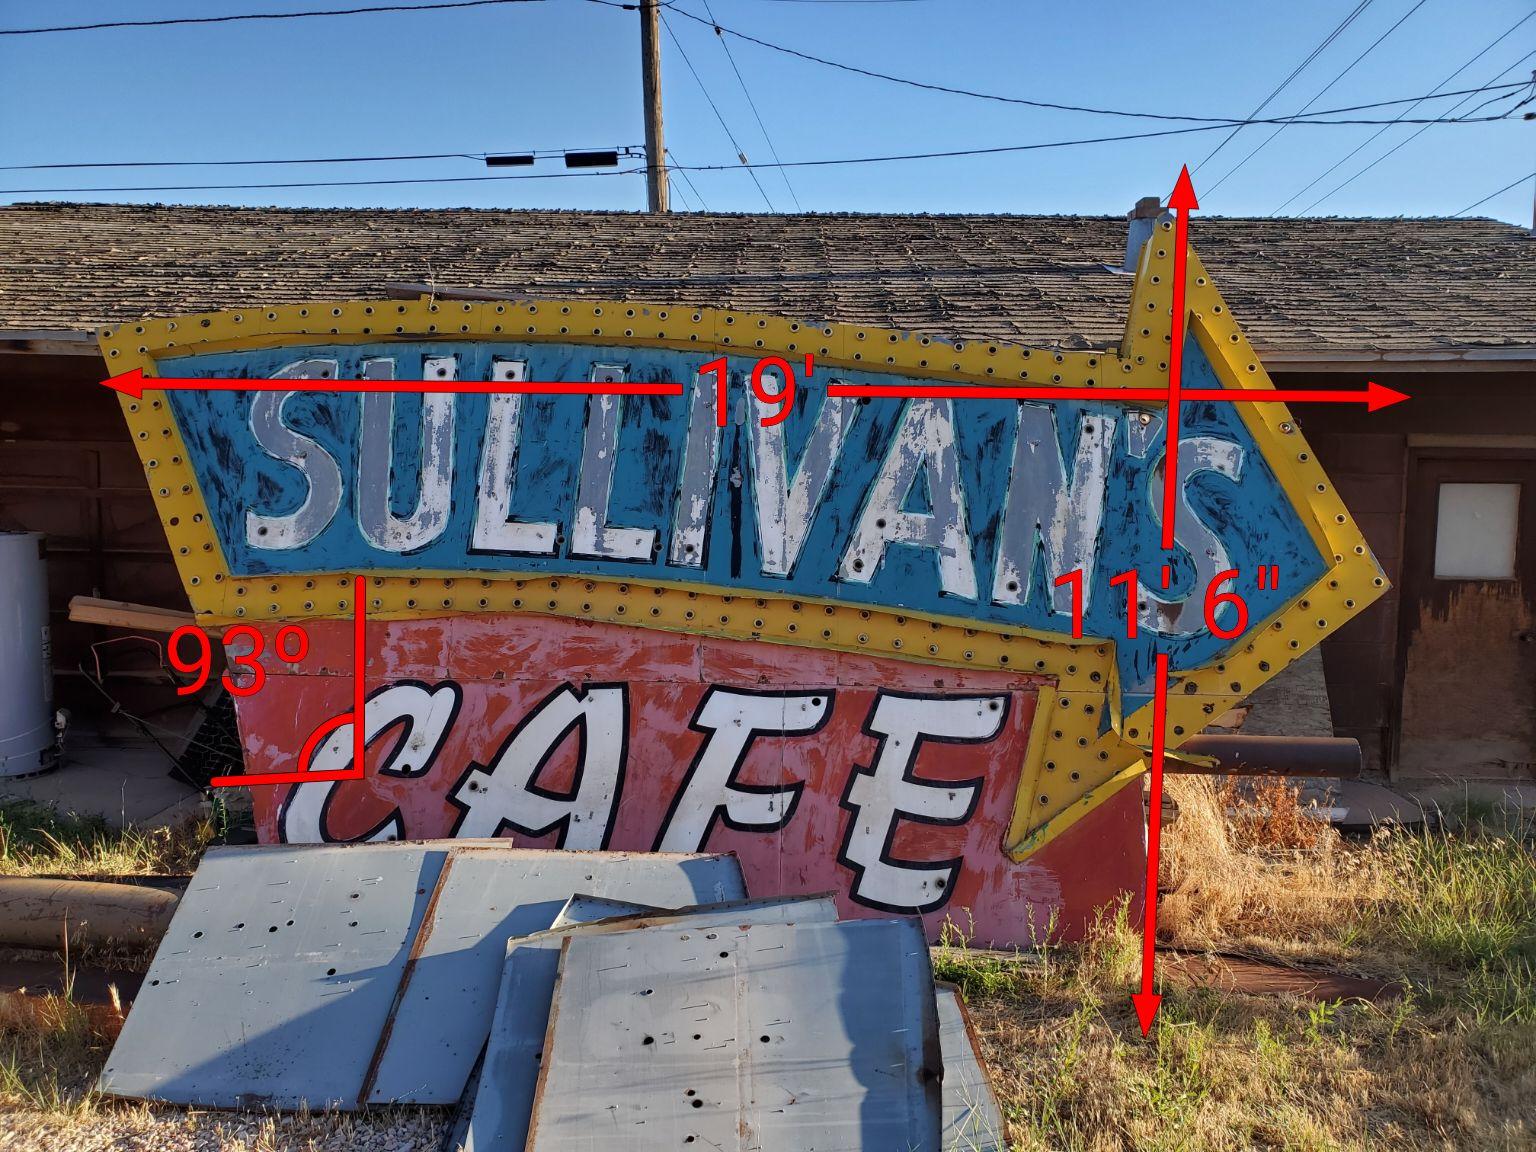 sullivans-cafe-neon-sign